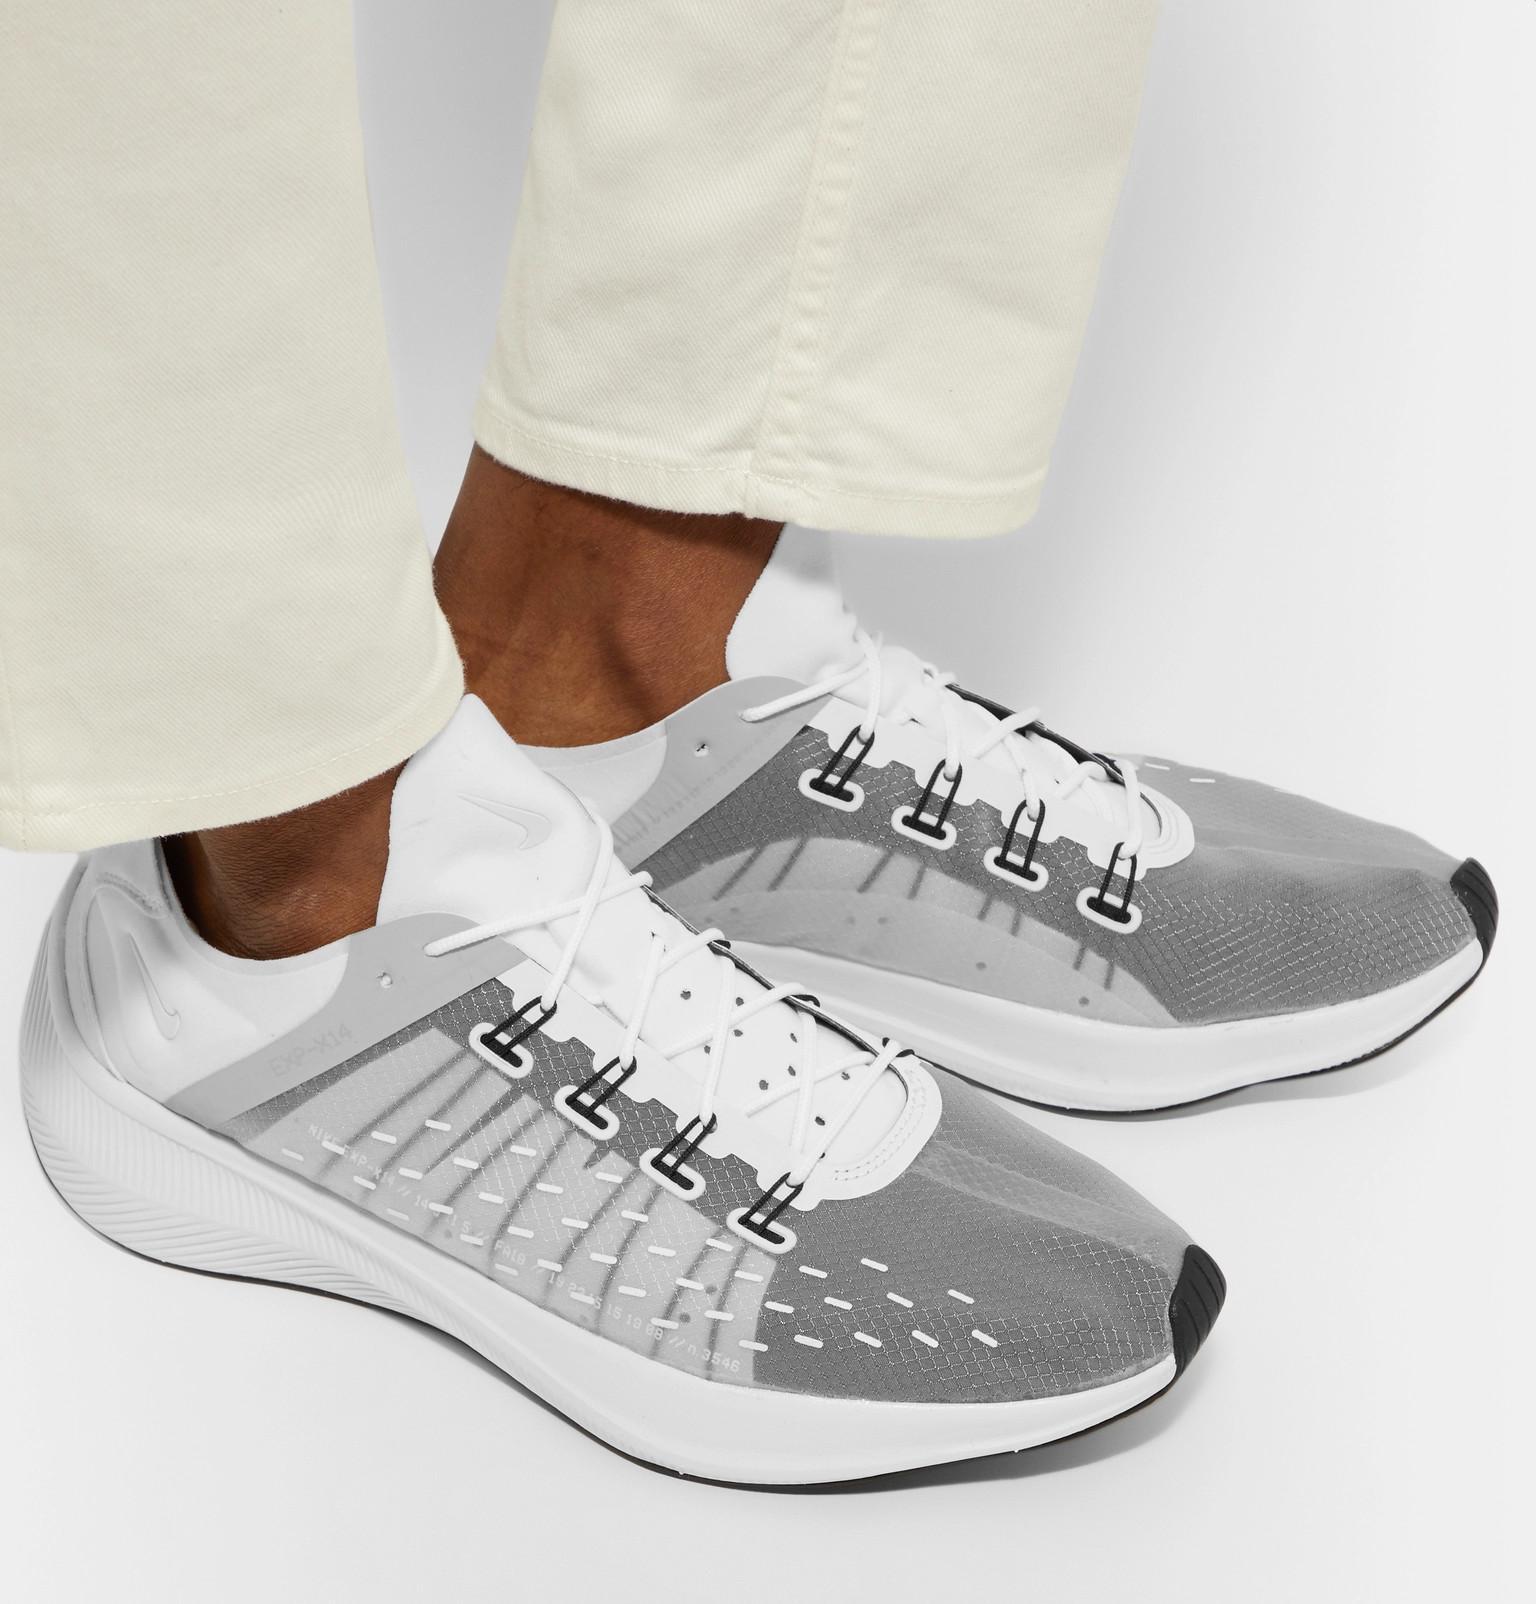 cinturón jurado Analgésico  Nike Denim Future Fast Racer Exp-x14 Sneakers in White for Men - Lyst